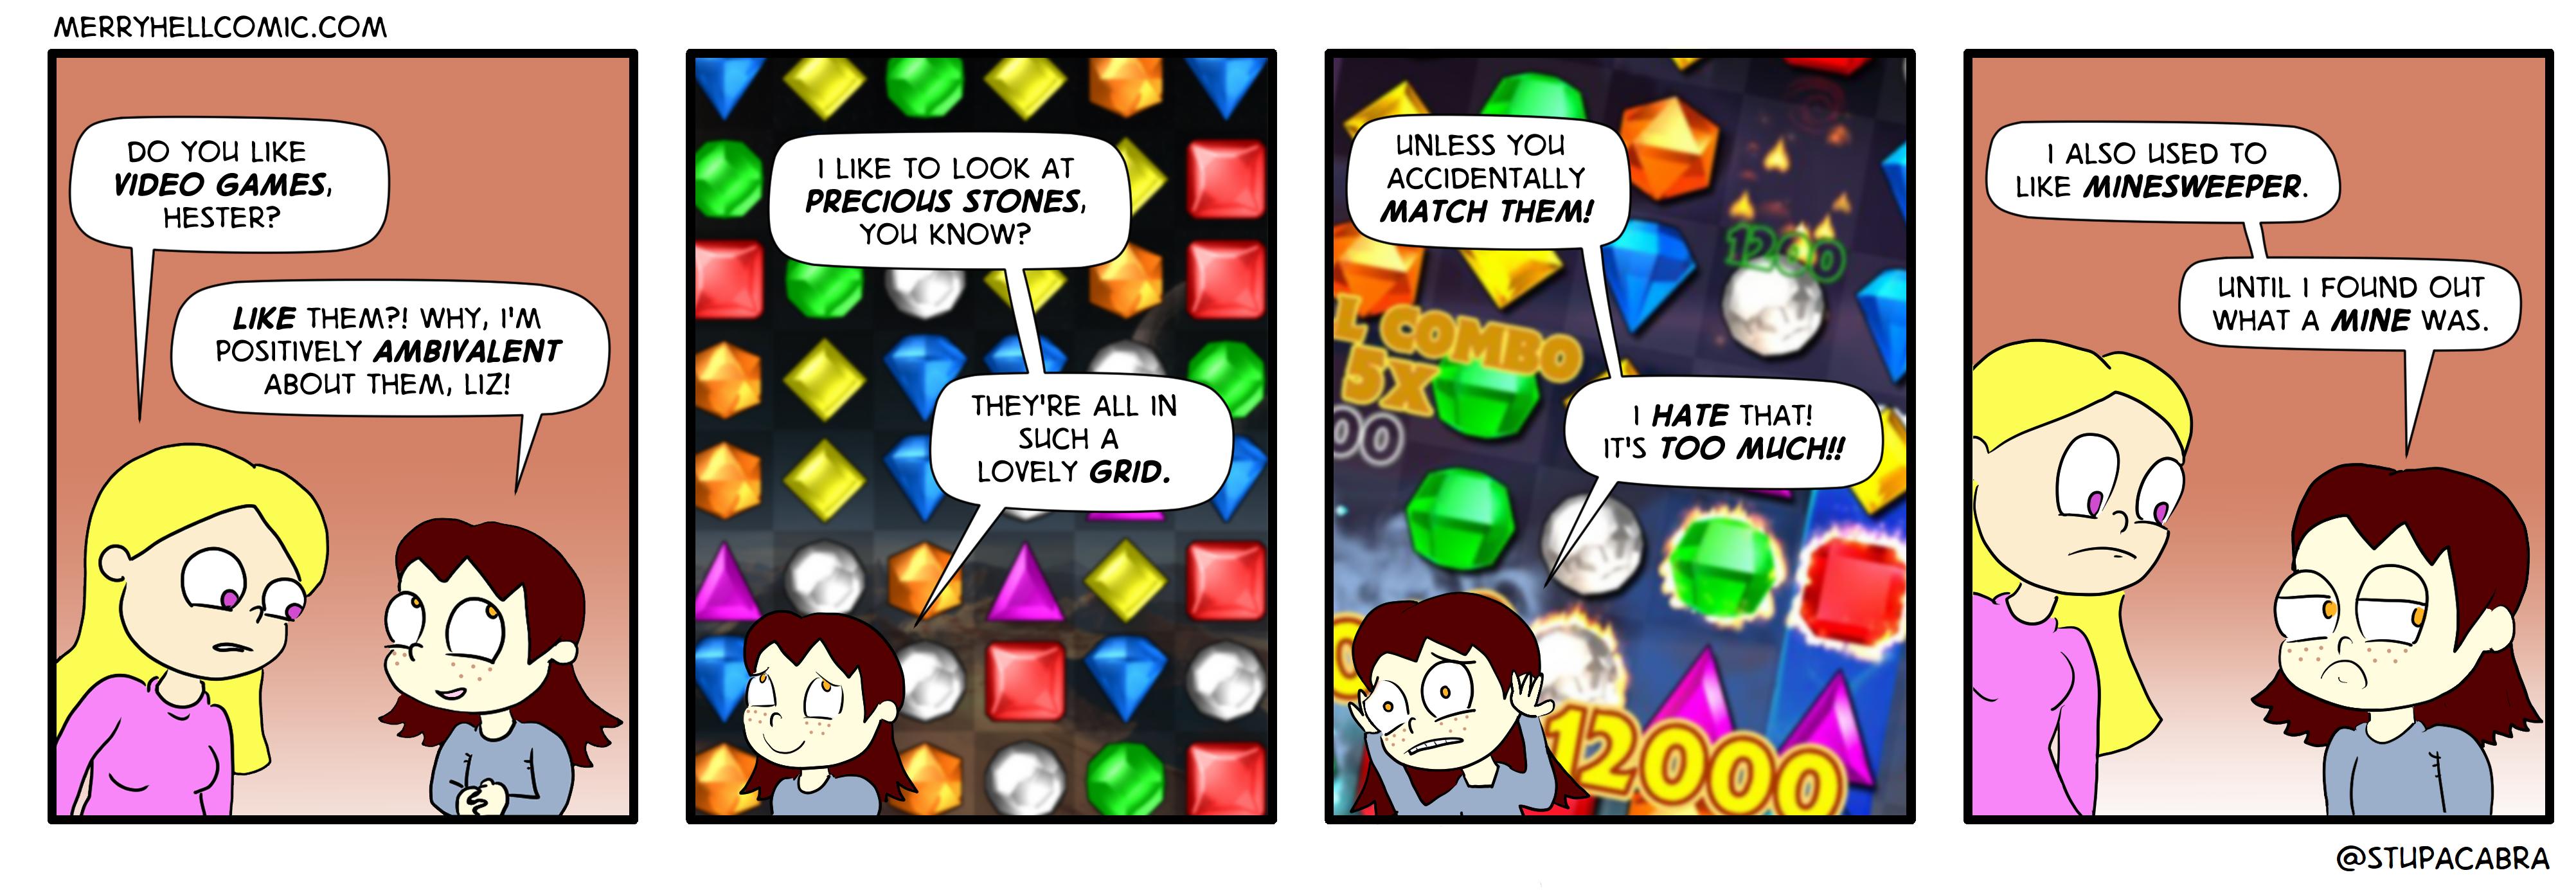 399. Precious stones